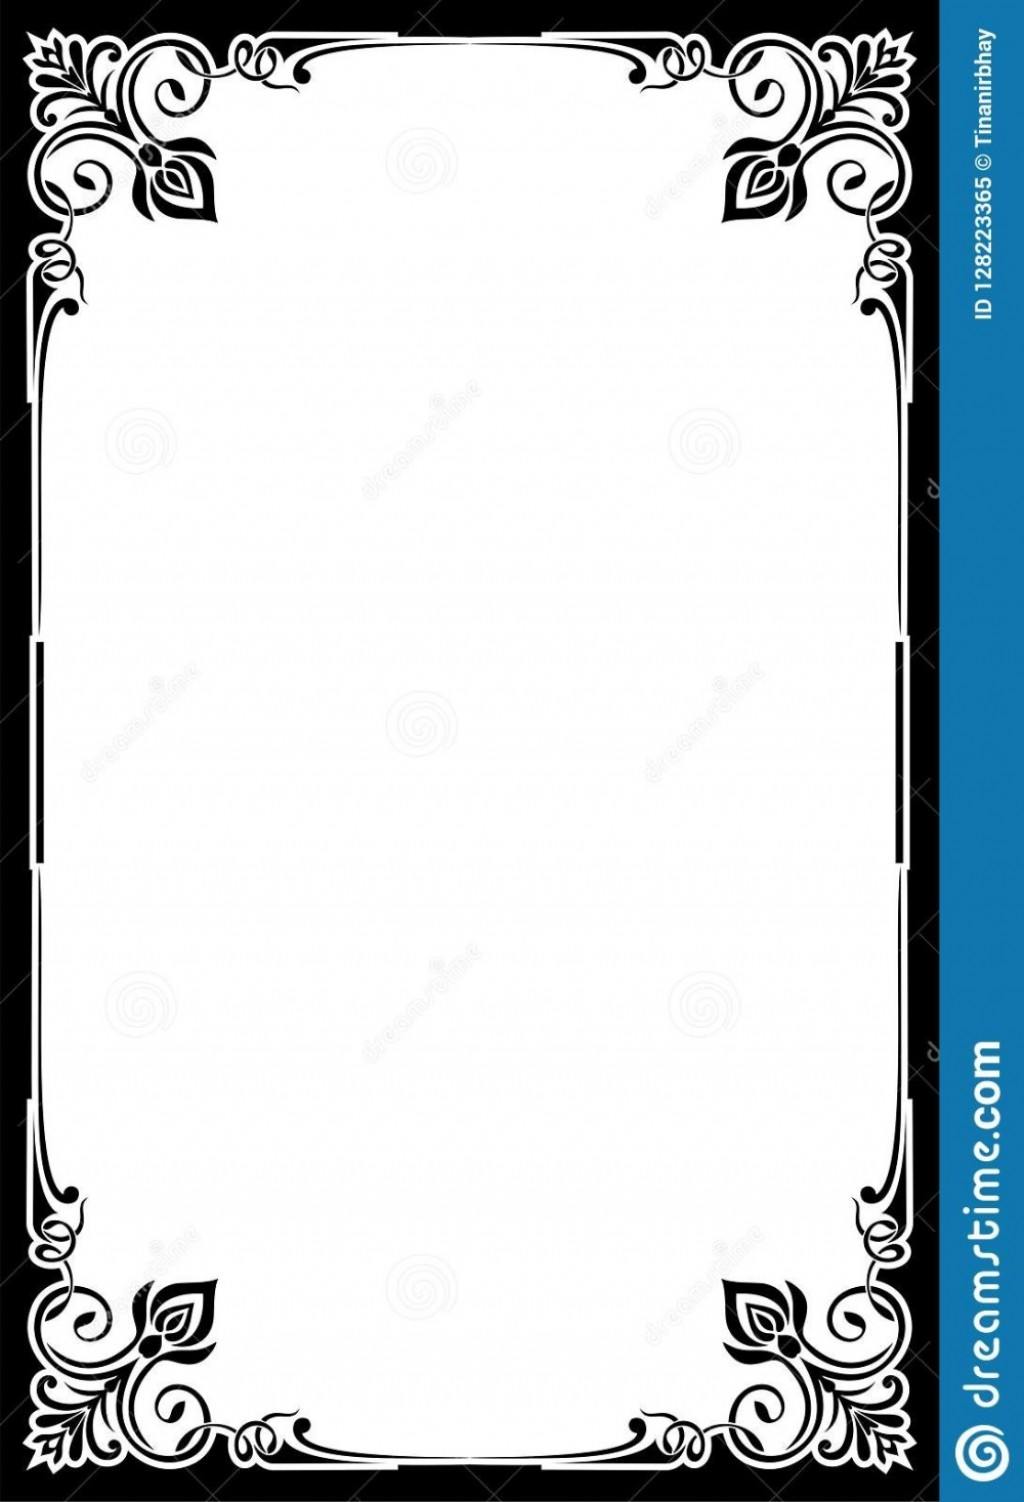 004 Incredible Blank Restaurant Menu Template Picture  Free Printable DownloadableLarge